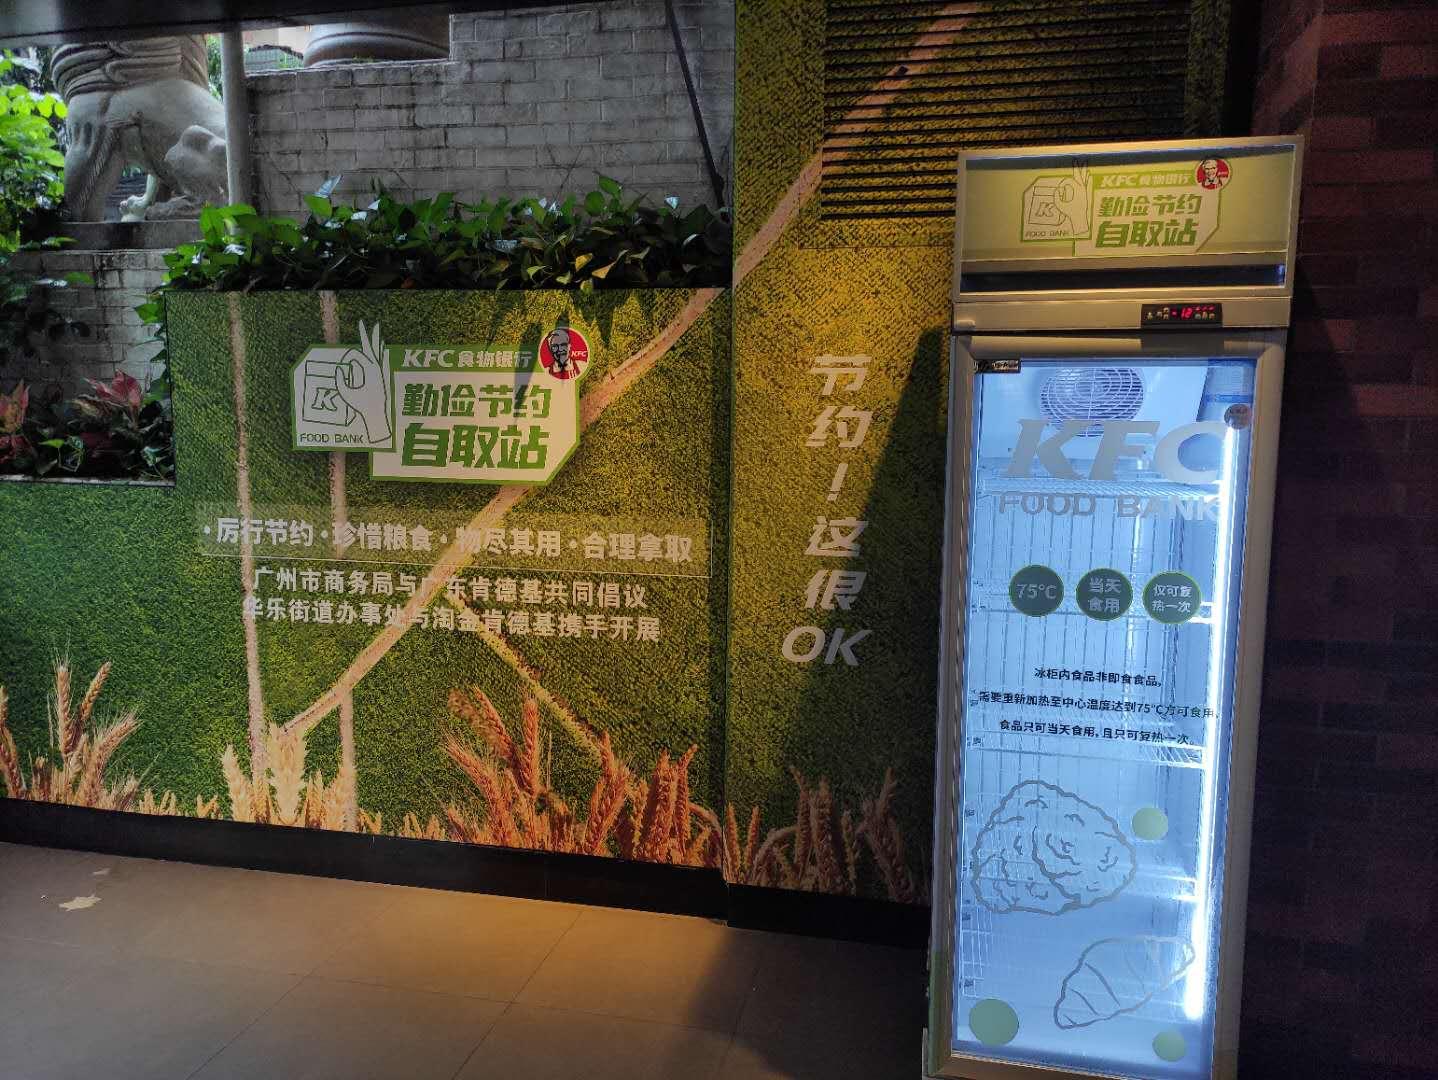 KFC、広州で食品ロス削減の取り組み始める